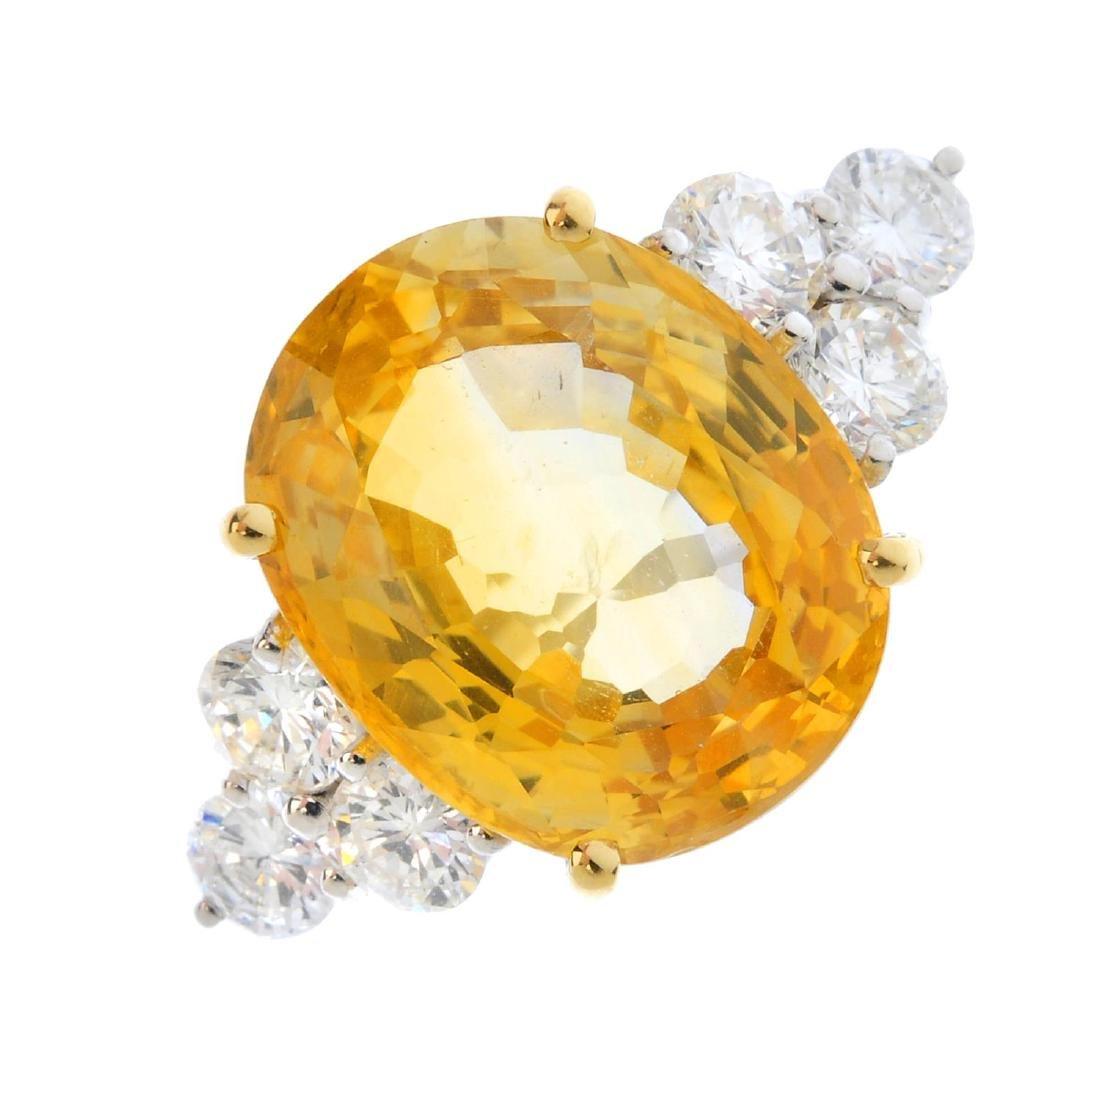 A sapphire and diamond dress ring. The oval-shape